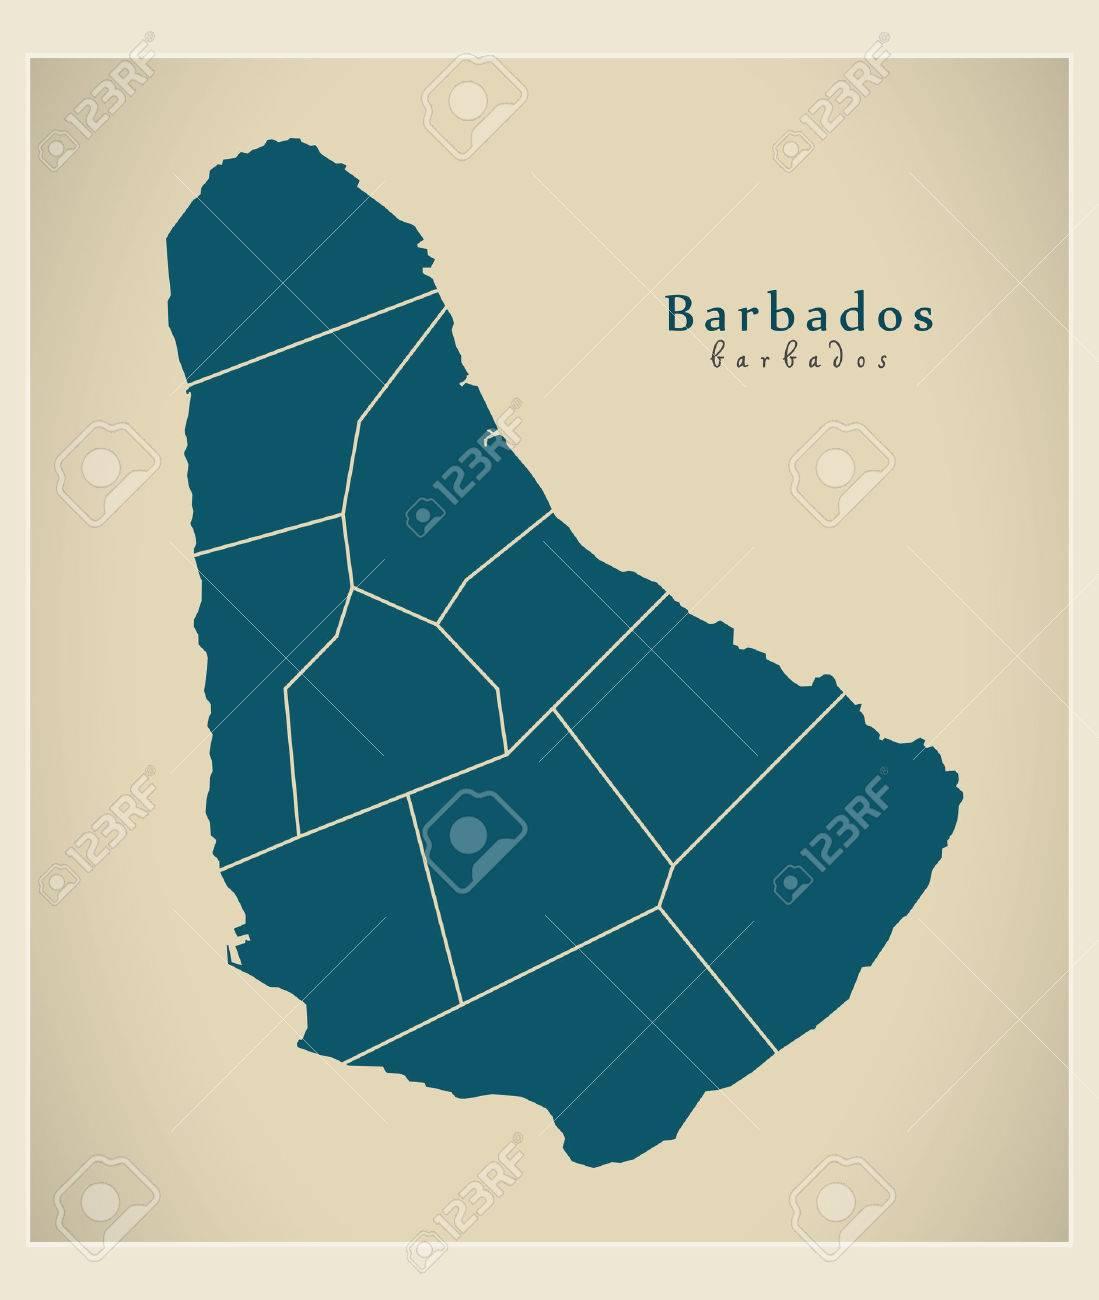 Modern Map - Barbados with parishes BB on flag of barbados, zimbabwe map, caribbean sea, grantley adams international airport, saint thomas, cayman islands map, barbados dollar, british virgin islands, bonaire island map, west indies map, americas map, greater antilles map, the bahamas, turks and caicos islands, bahamas map, caribbean map, barbadian people, carribean map, jamaica map, virgin islands map, cuba map, trinidad and tobago, tanzania map, puerto rico map, windward islands, haiti map, antigua and barbuda, belize map, aruba map, united states map, saint vincent, maldives island map, world map, saint vincent and the grenadines,